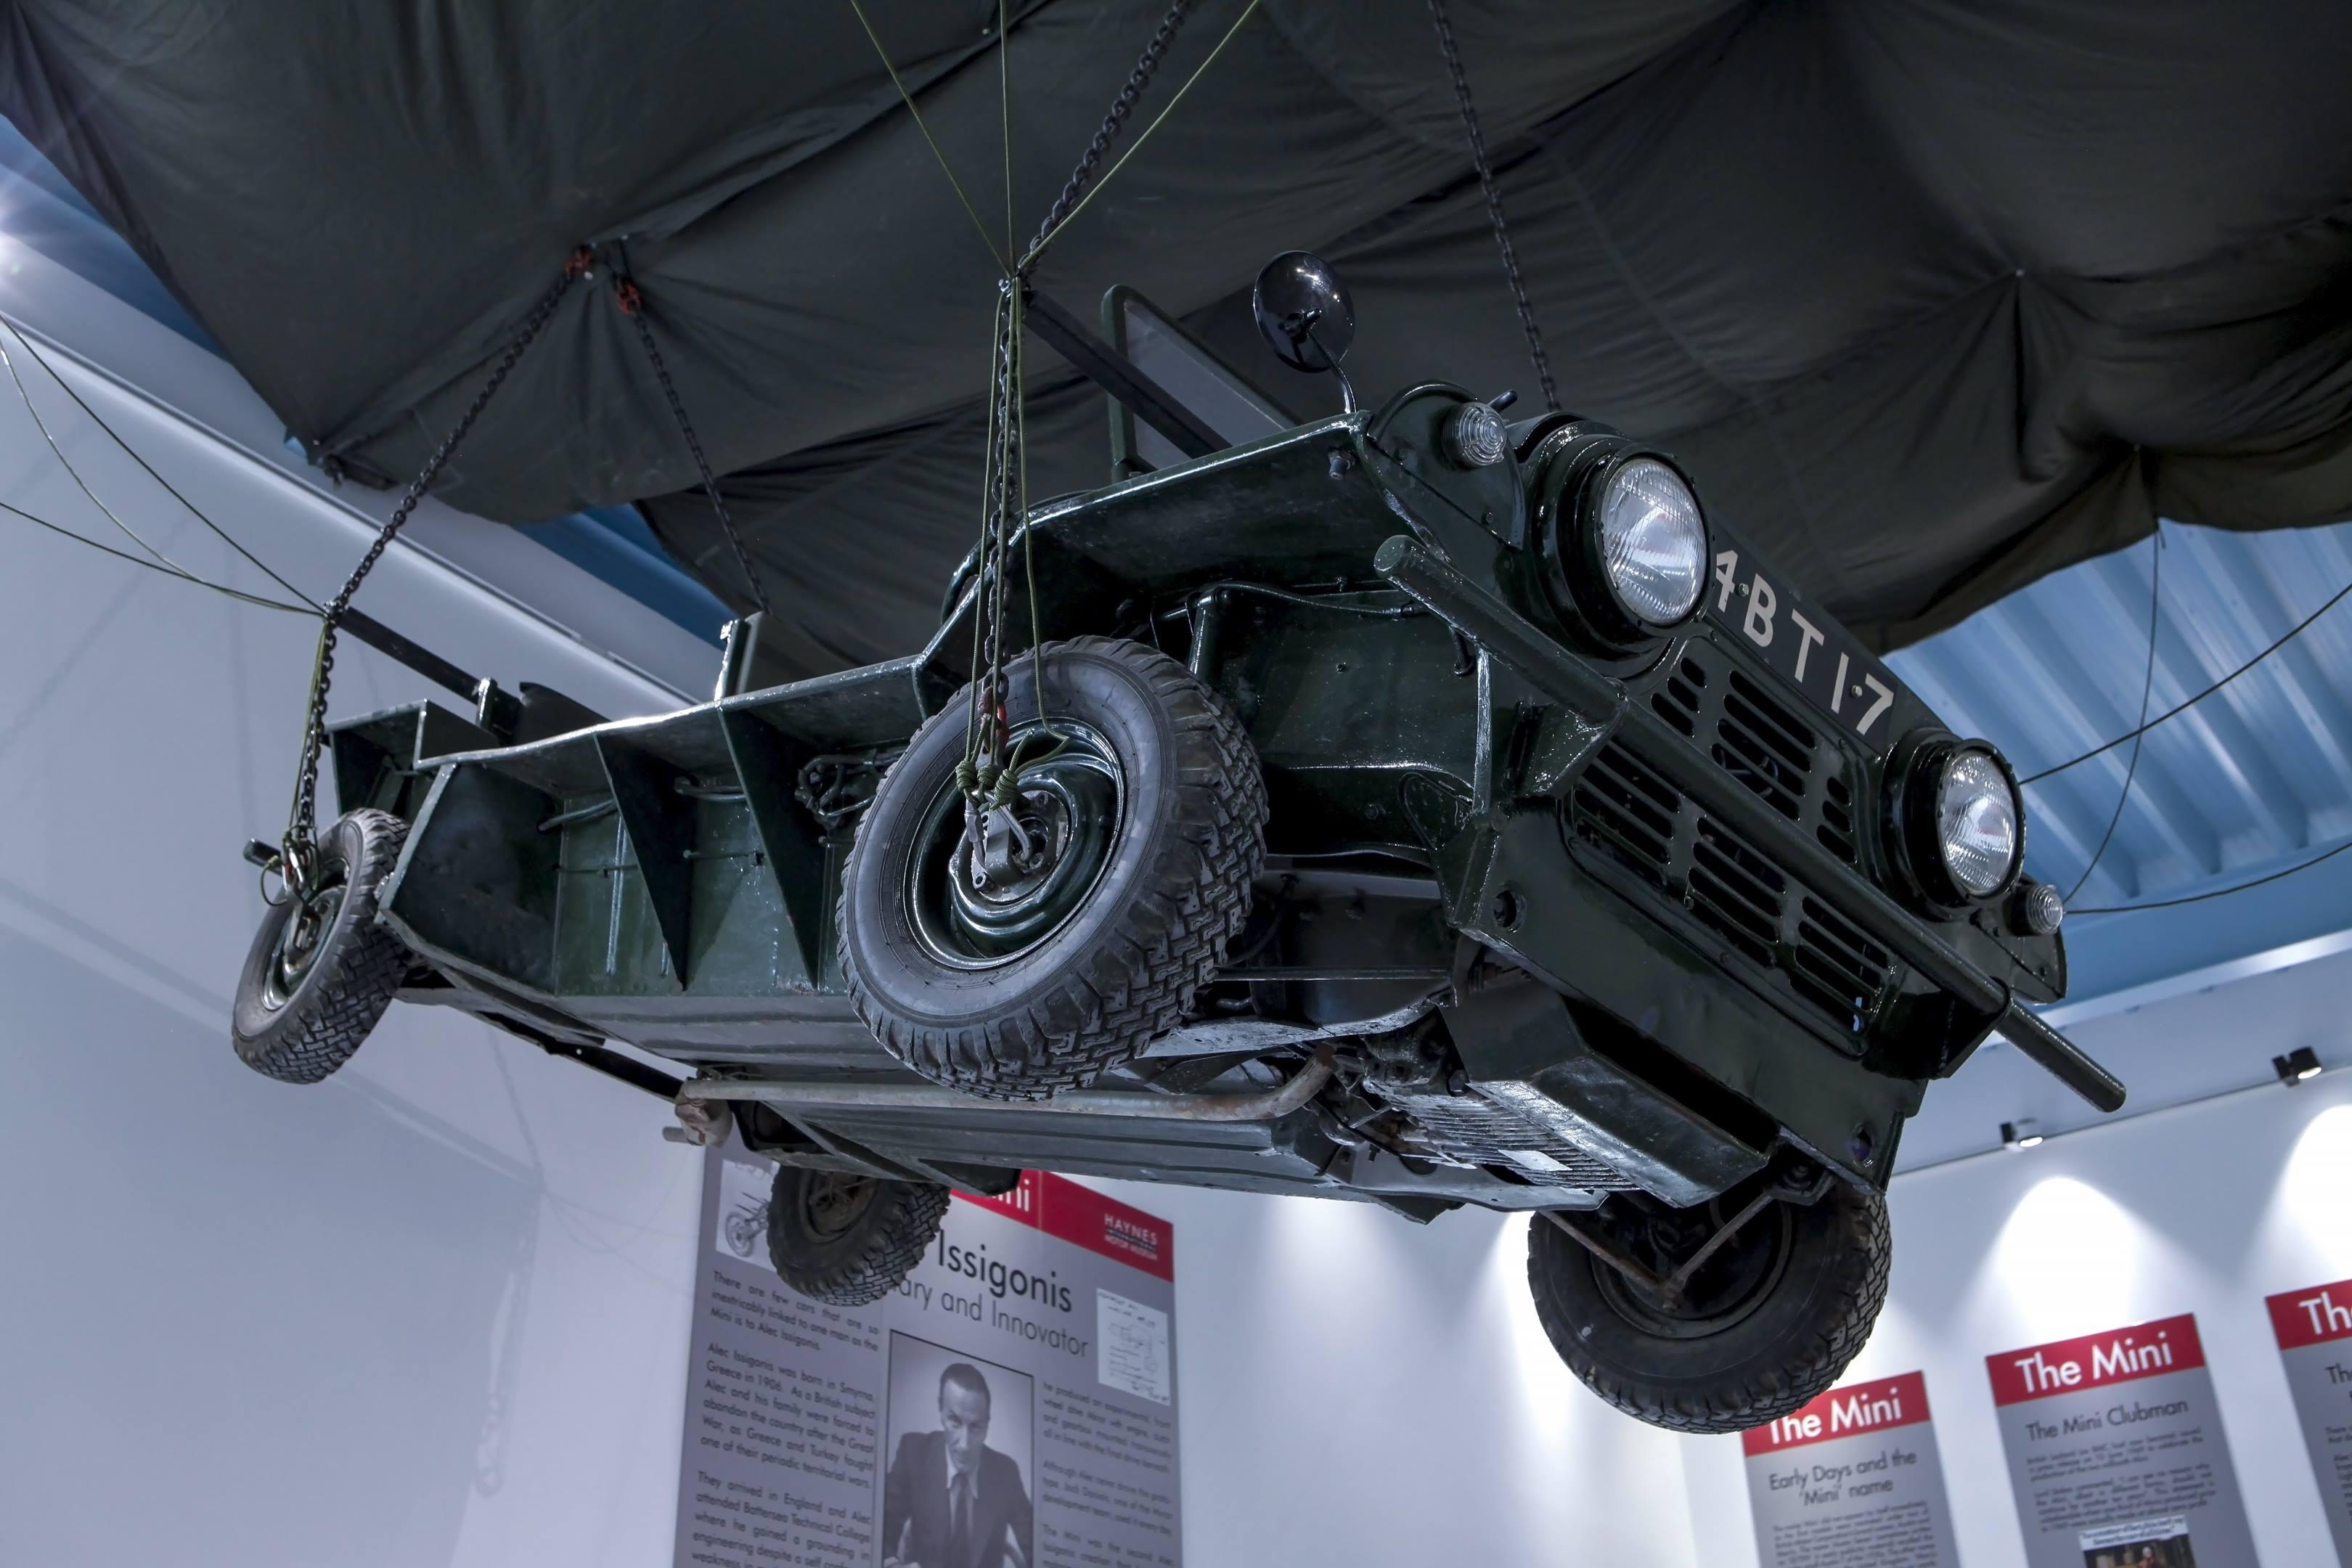 mini moke hanging from the ceiling at Haynes International Motor Museum